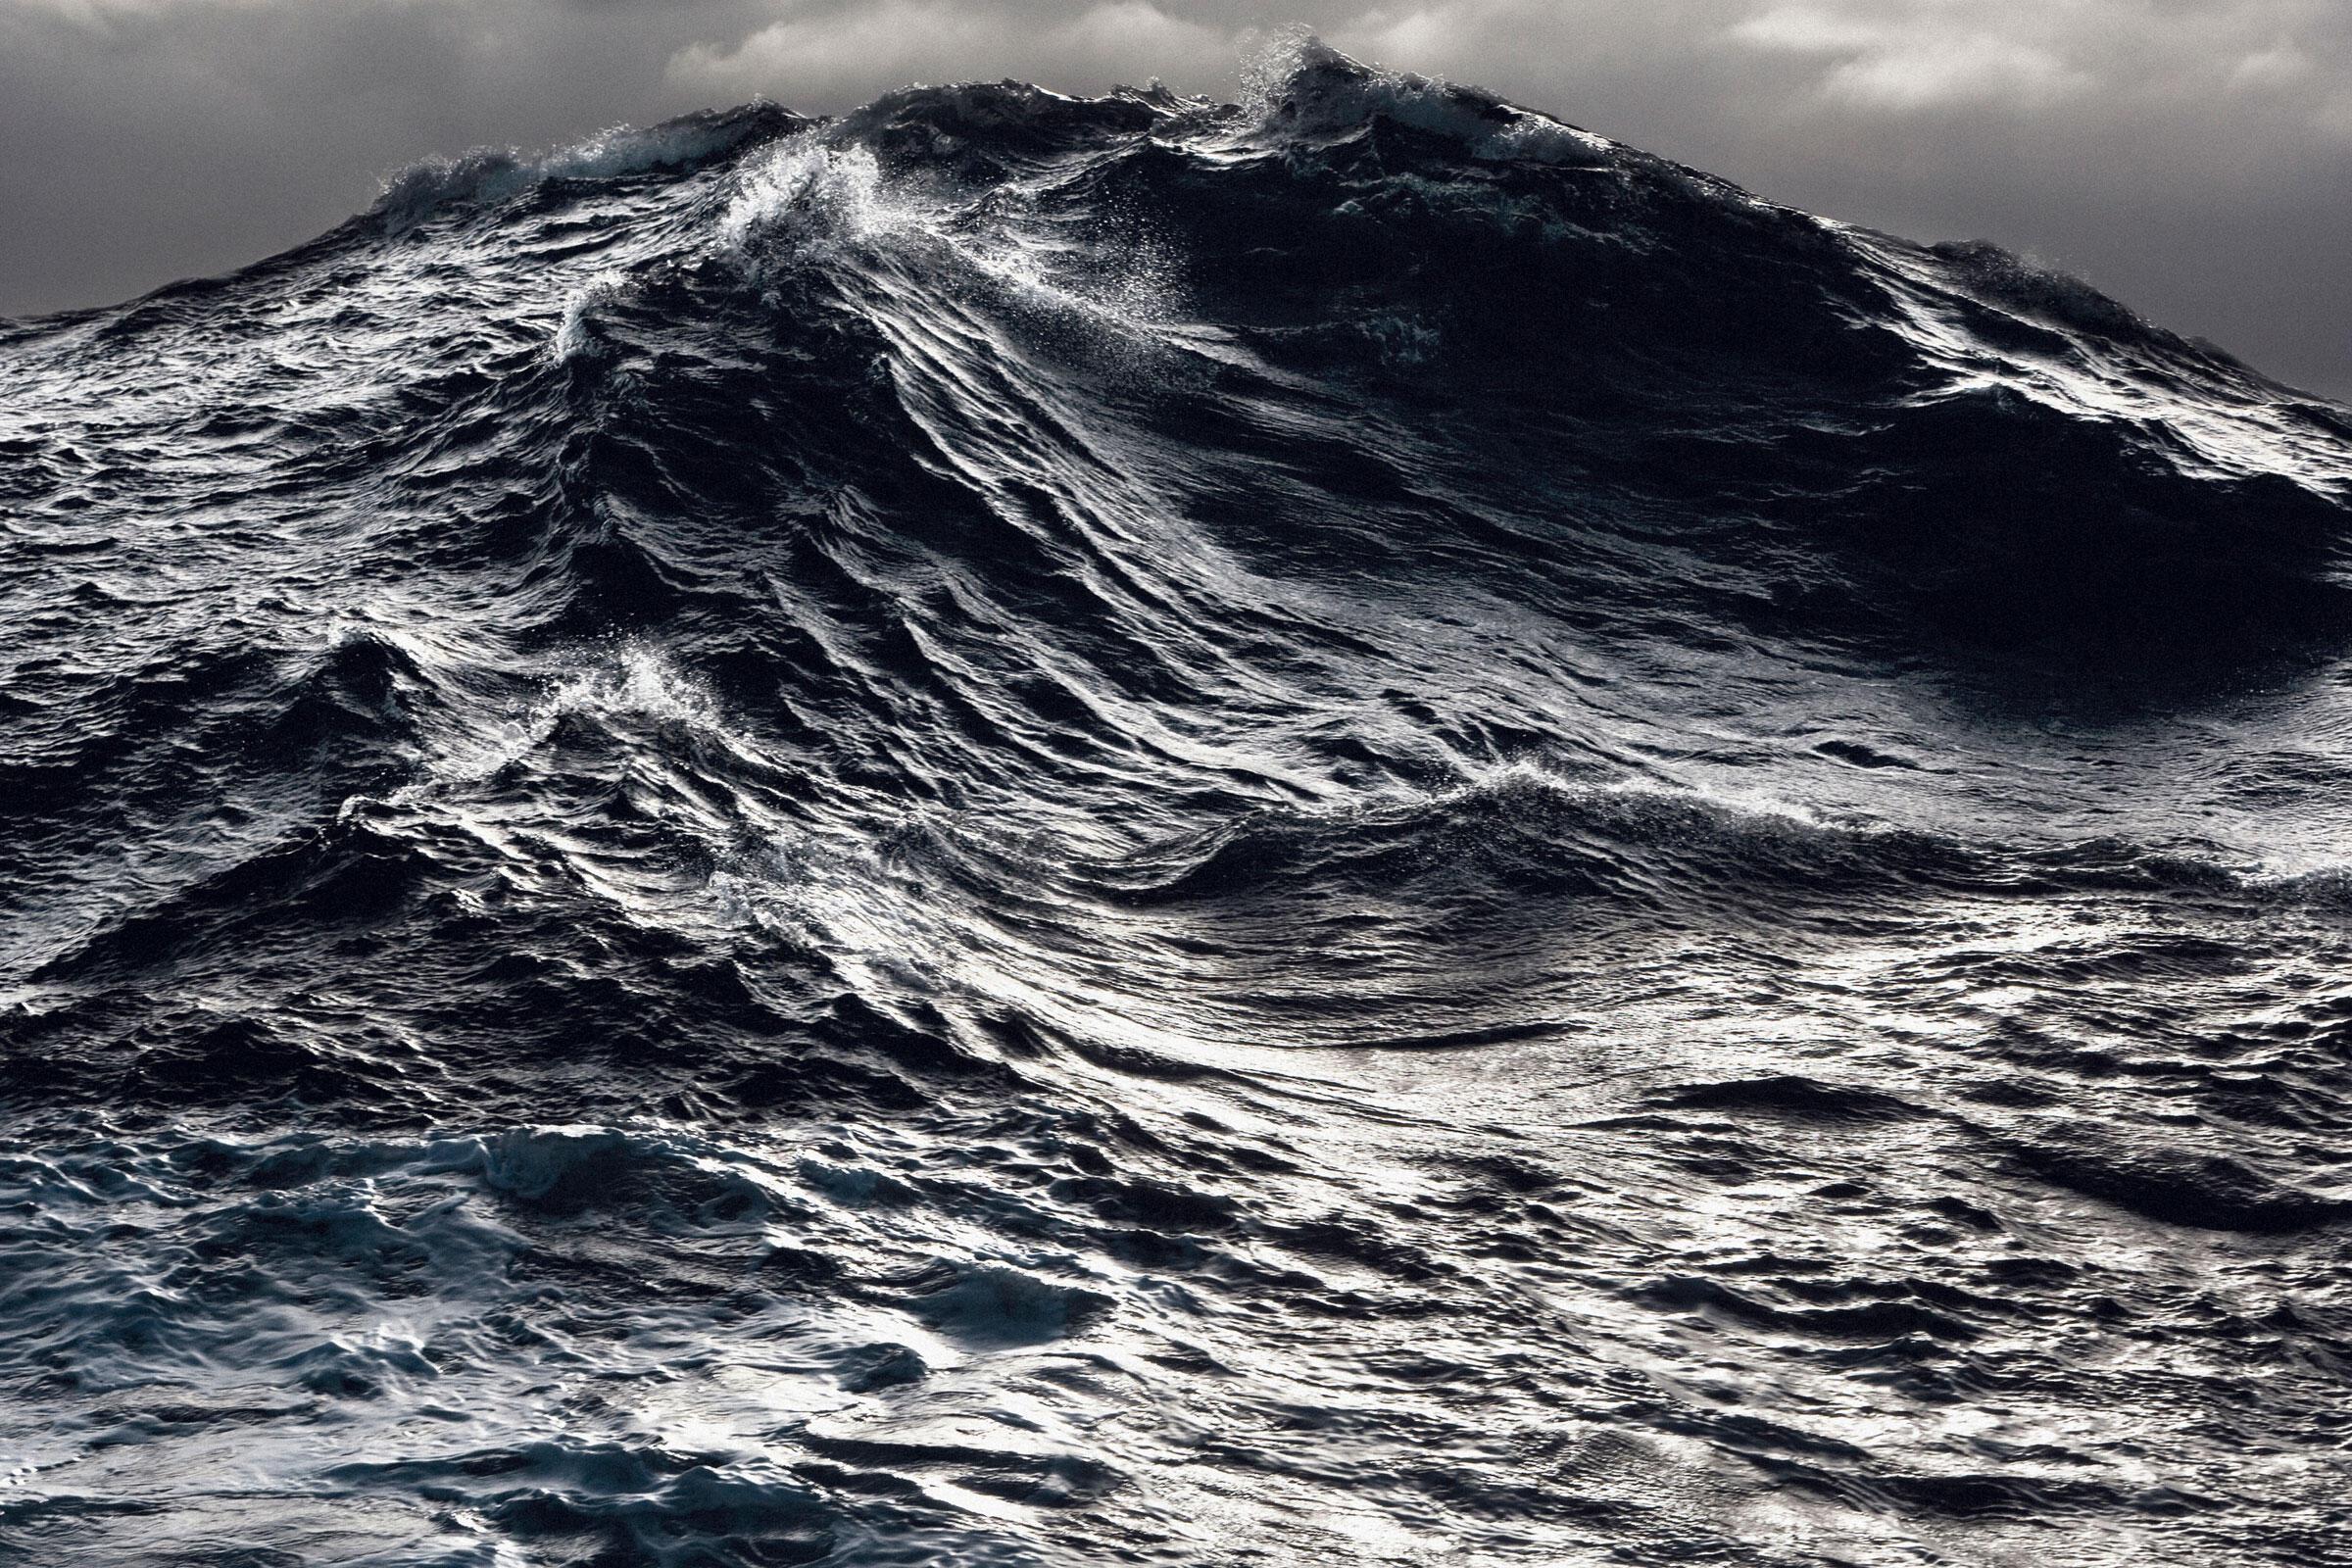 Wave in the southern ocean. Ross Sea, Antartica. John Weller